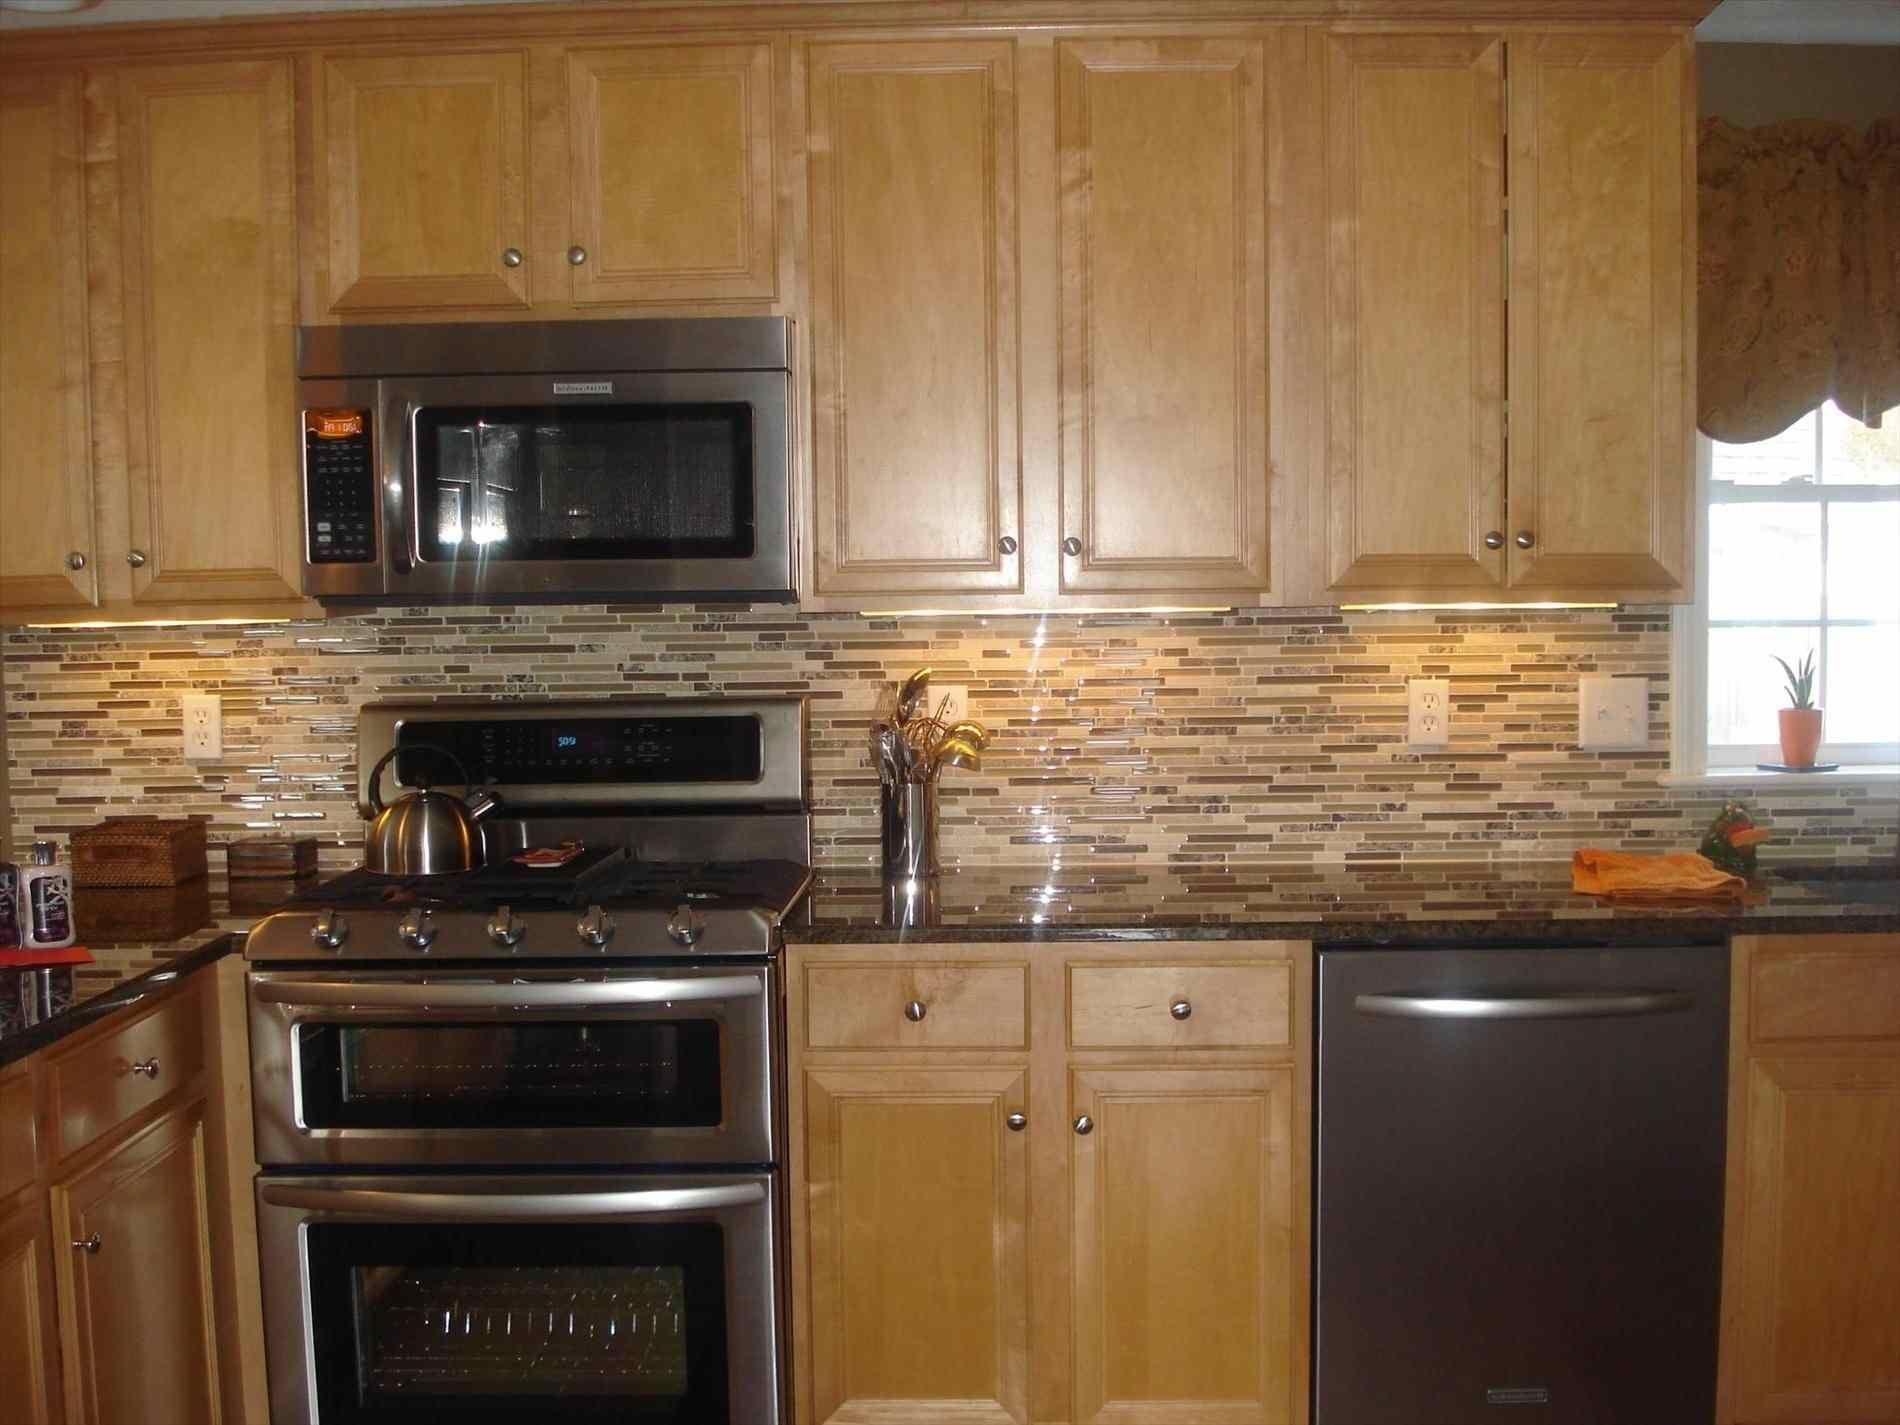 light oak cabinets dark countertops   DeducTour.com ... on Backsplash Maple Cabinets With Black Countertops  id=97461